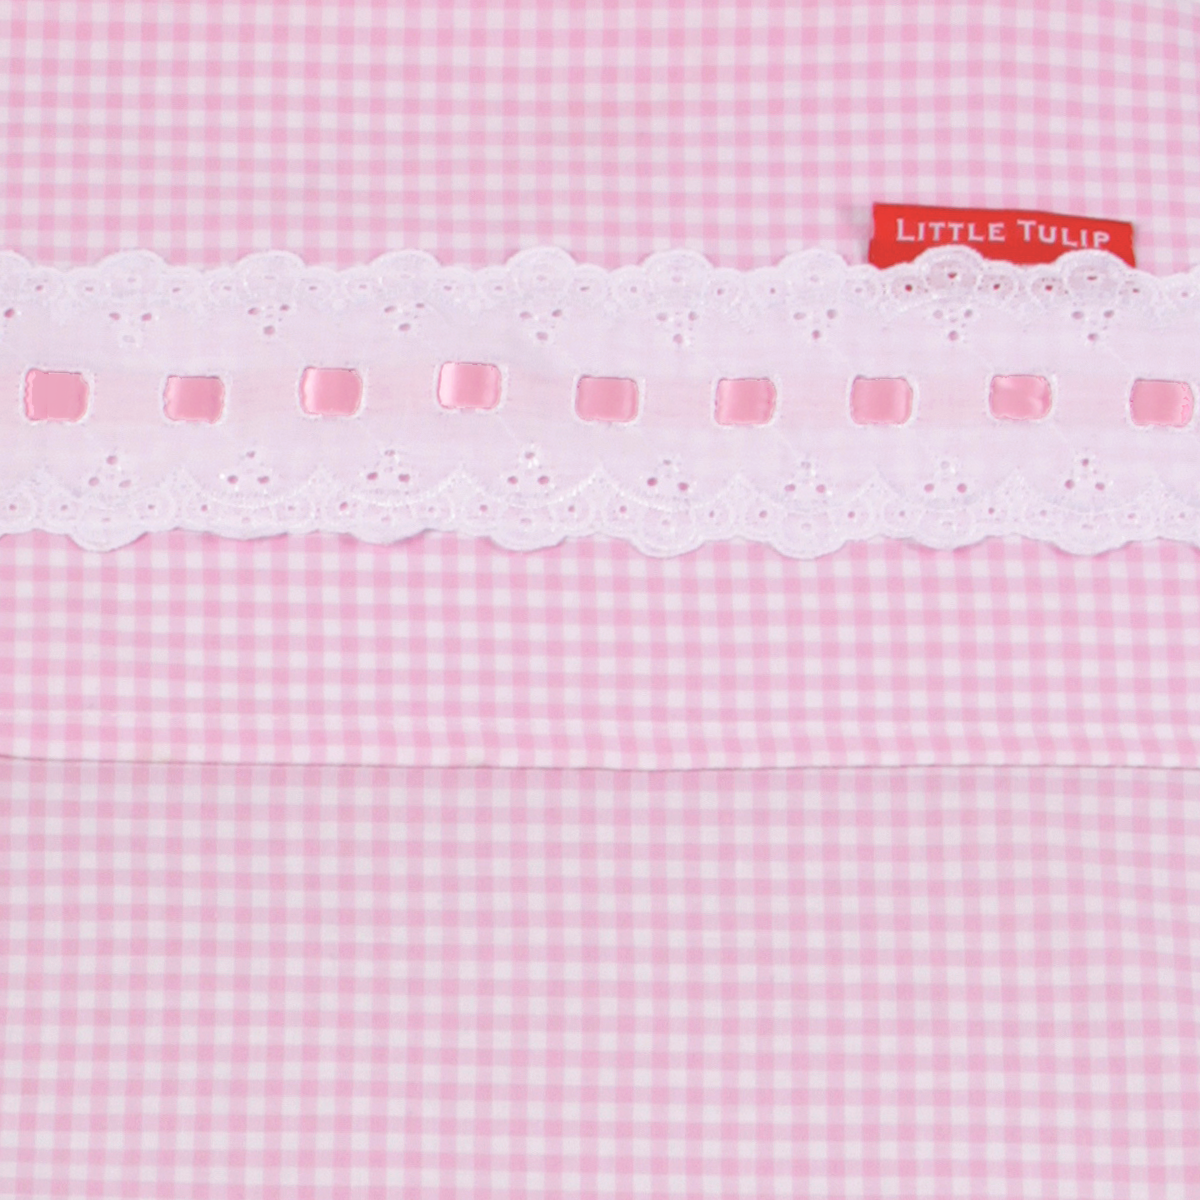 Dekbedovertrek Roze Ruit  Dekbedovertrek ledikant roze ruit met hartjes  Roze dekbedovertrek